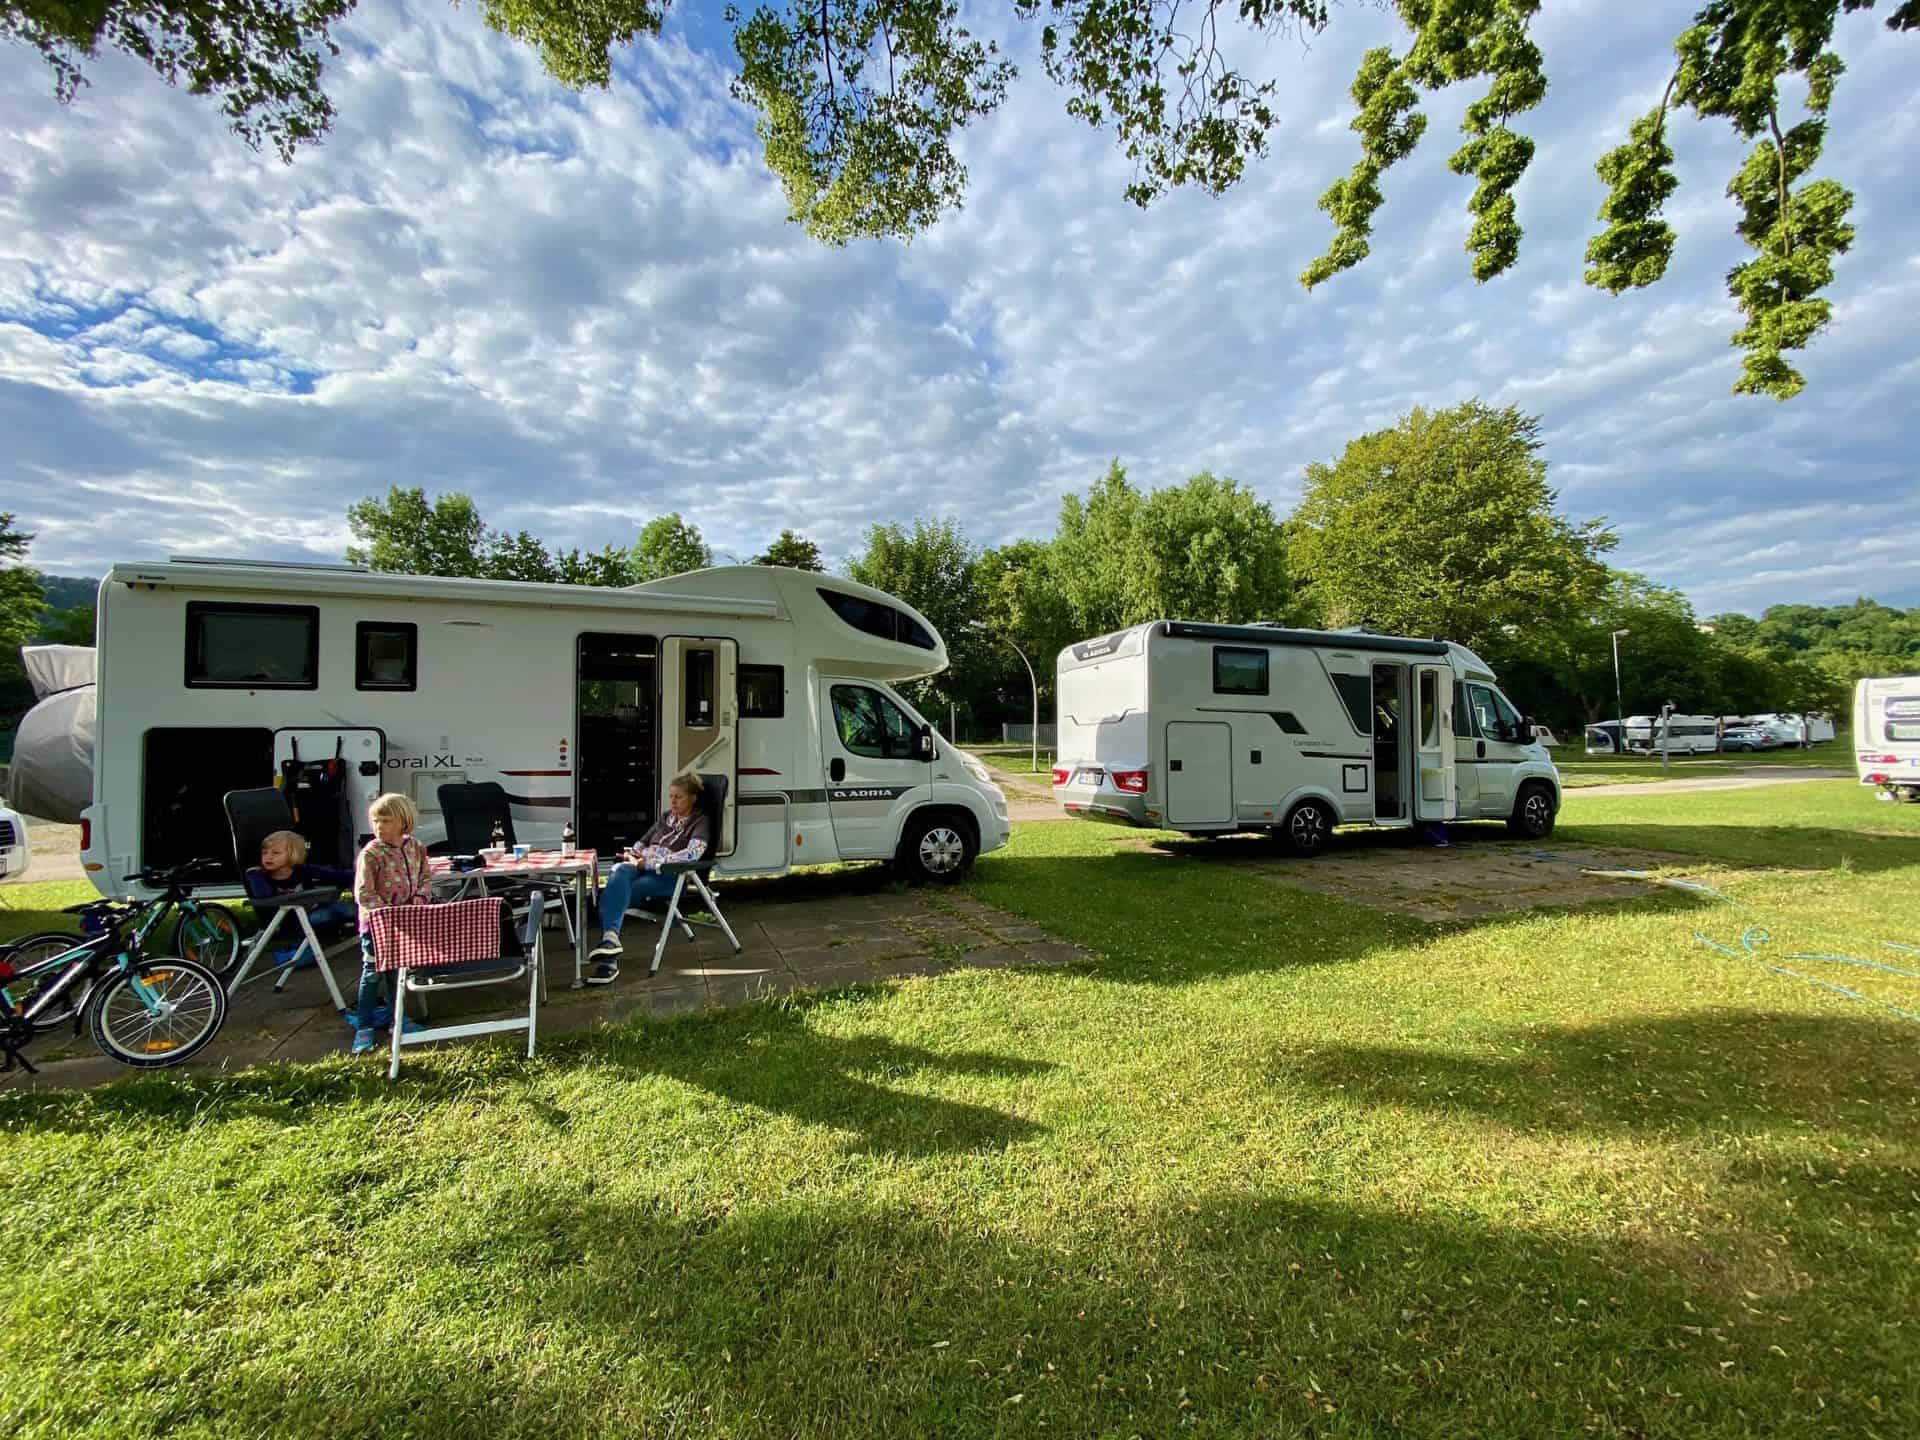 Campingplatz-Fortuna-Wohnmobil-Roland-Flo